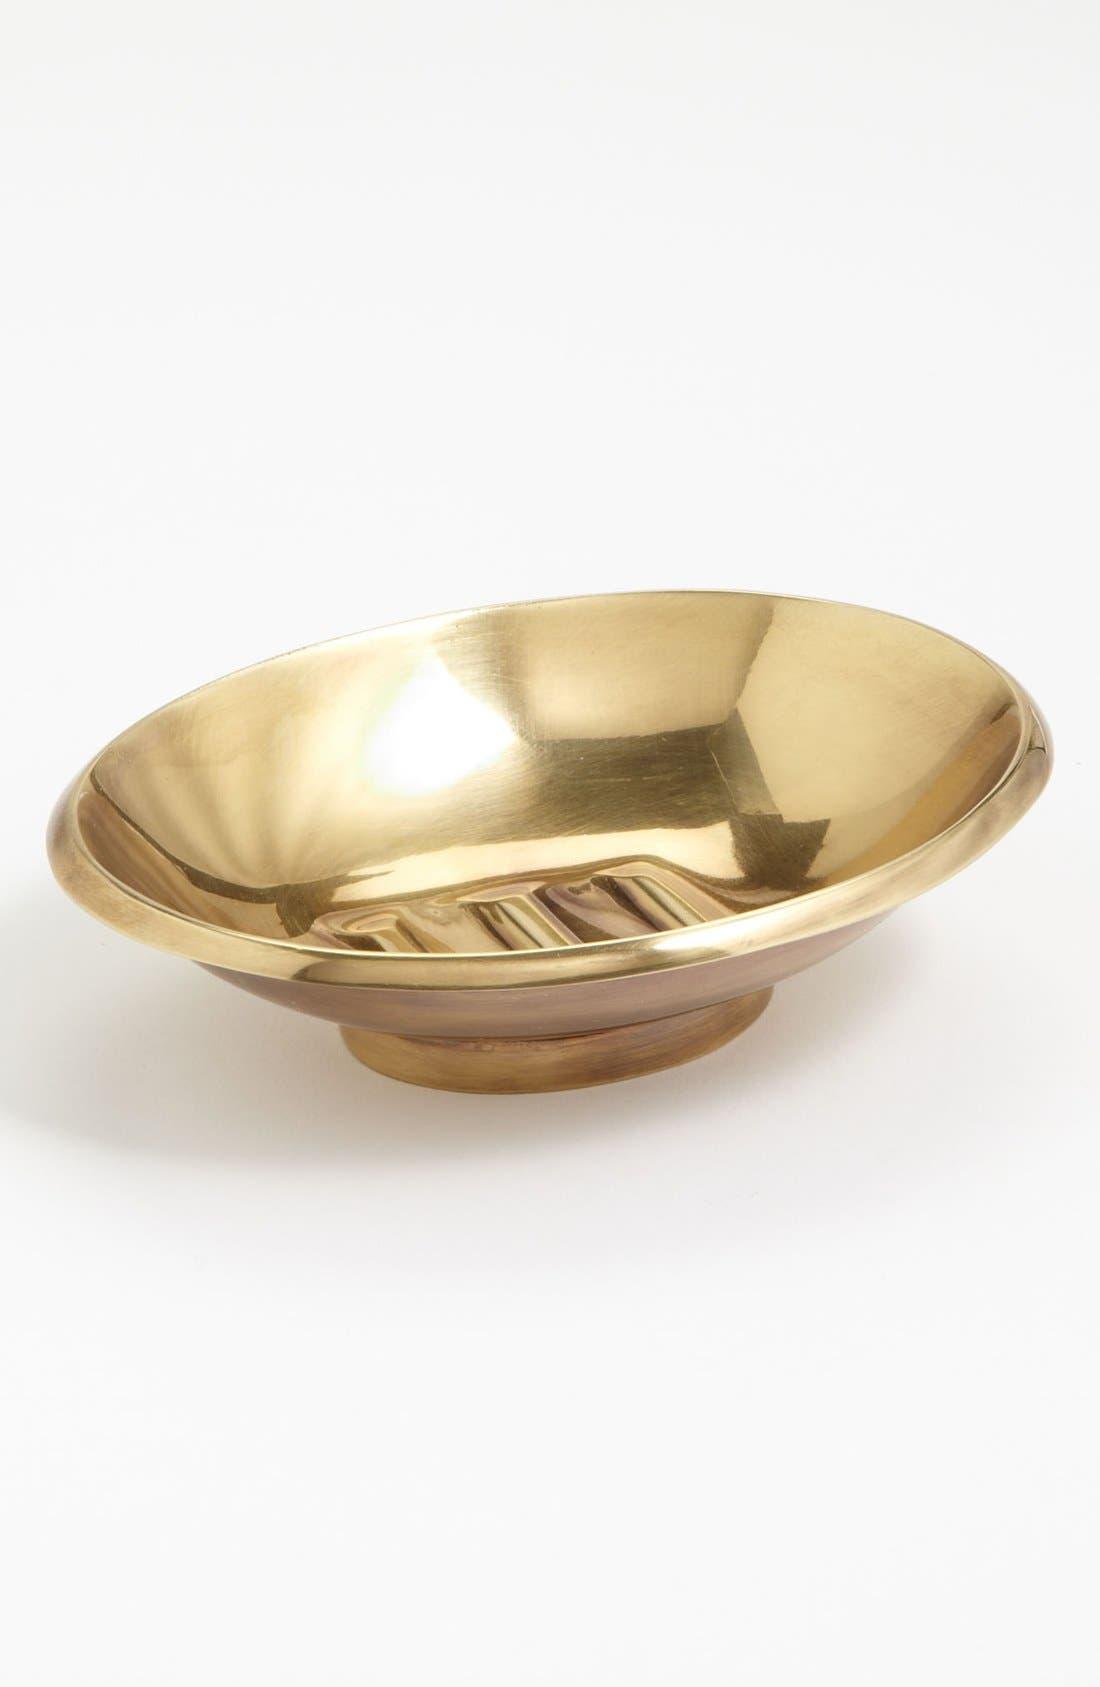 Alternate Image 1 Selected - Waterworks Studio 'Wallingford' Soap Dish (Online Only)